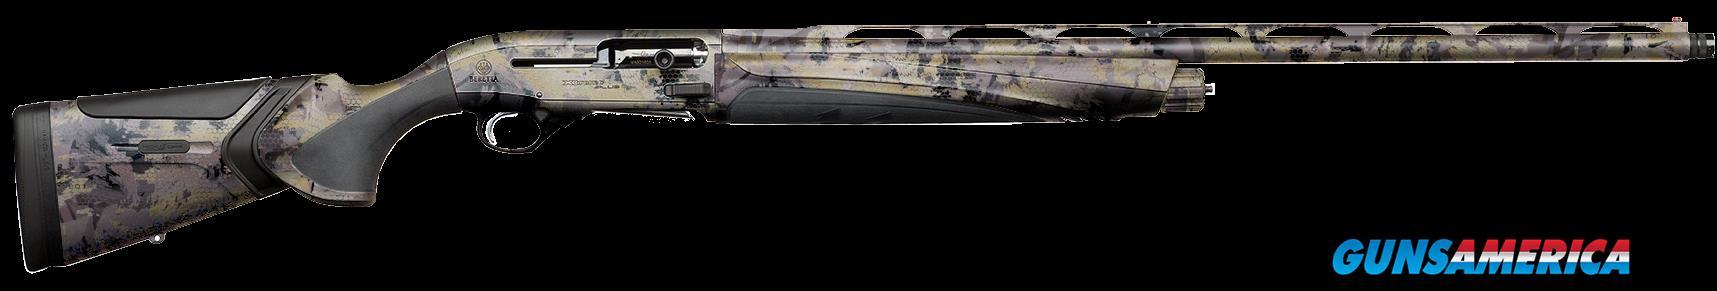 Beretta Usa A400, Ber J42xn16   A400 Xtr Plus Ko 12 26 3.5 Optfdtmbr  Guns > Pistols > 1911 Pistol Copies (non-Colt)